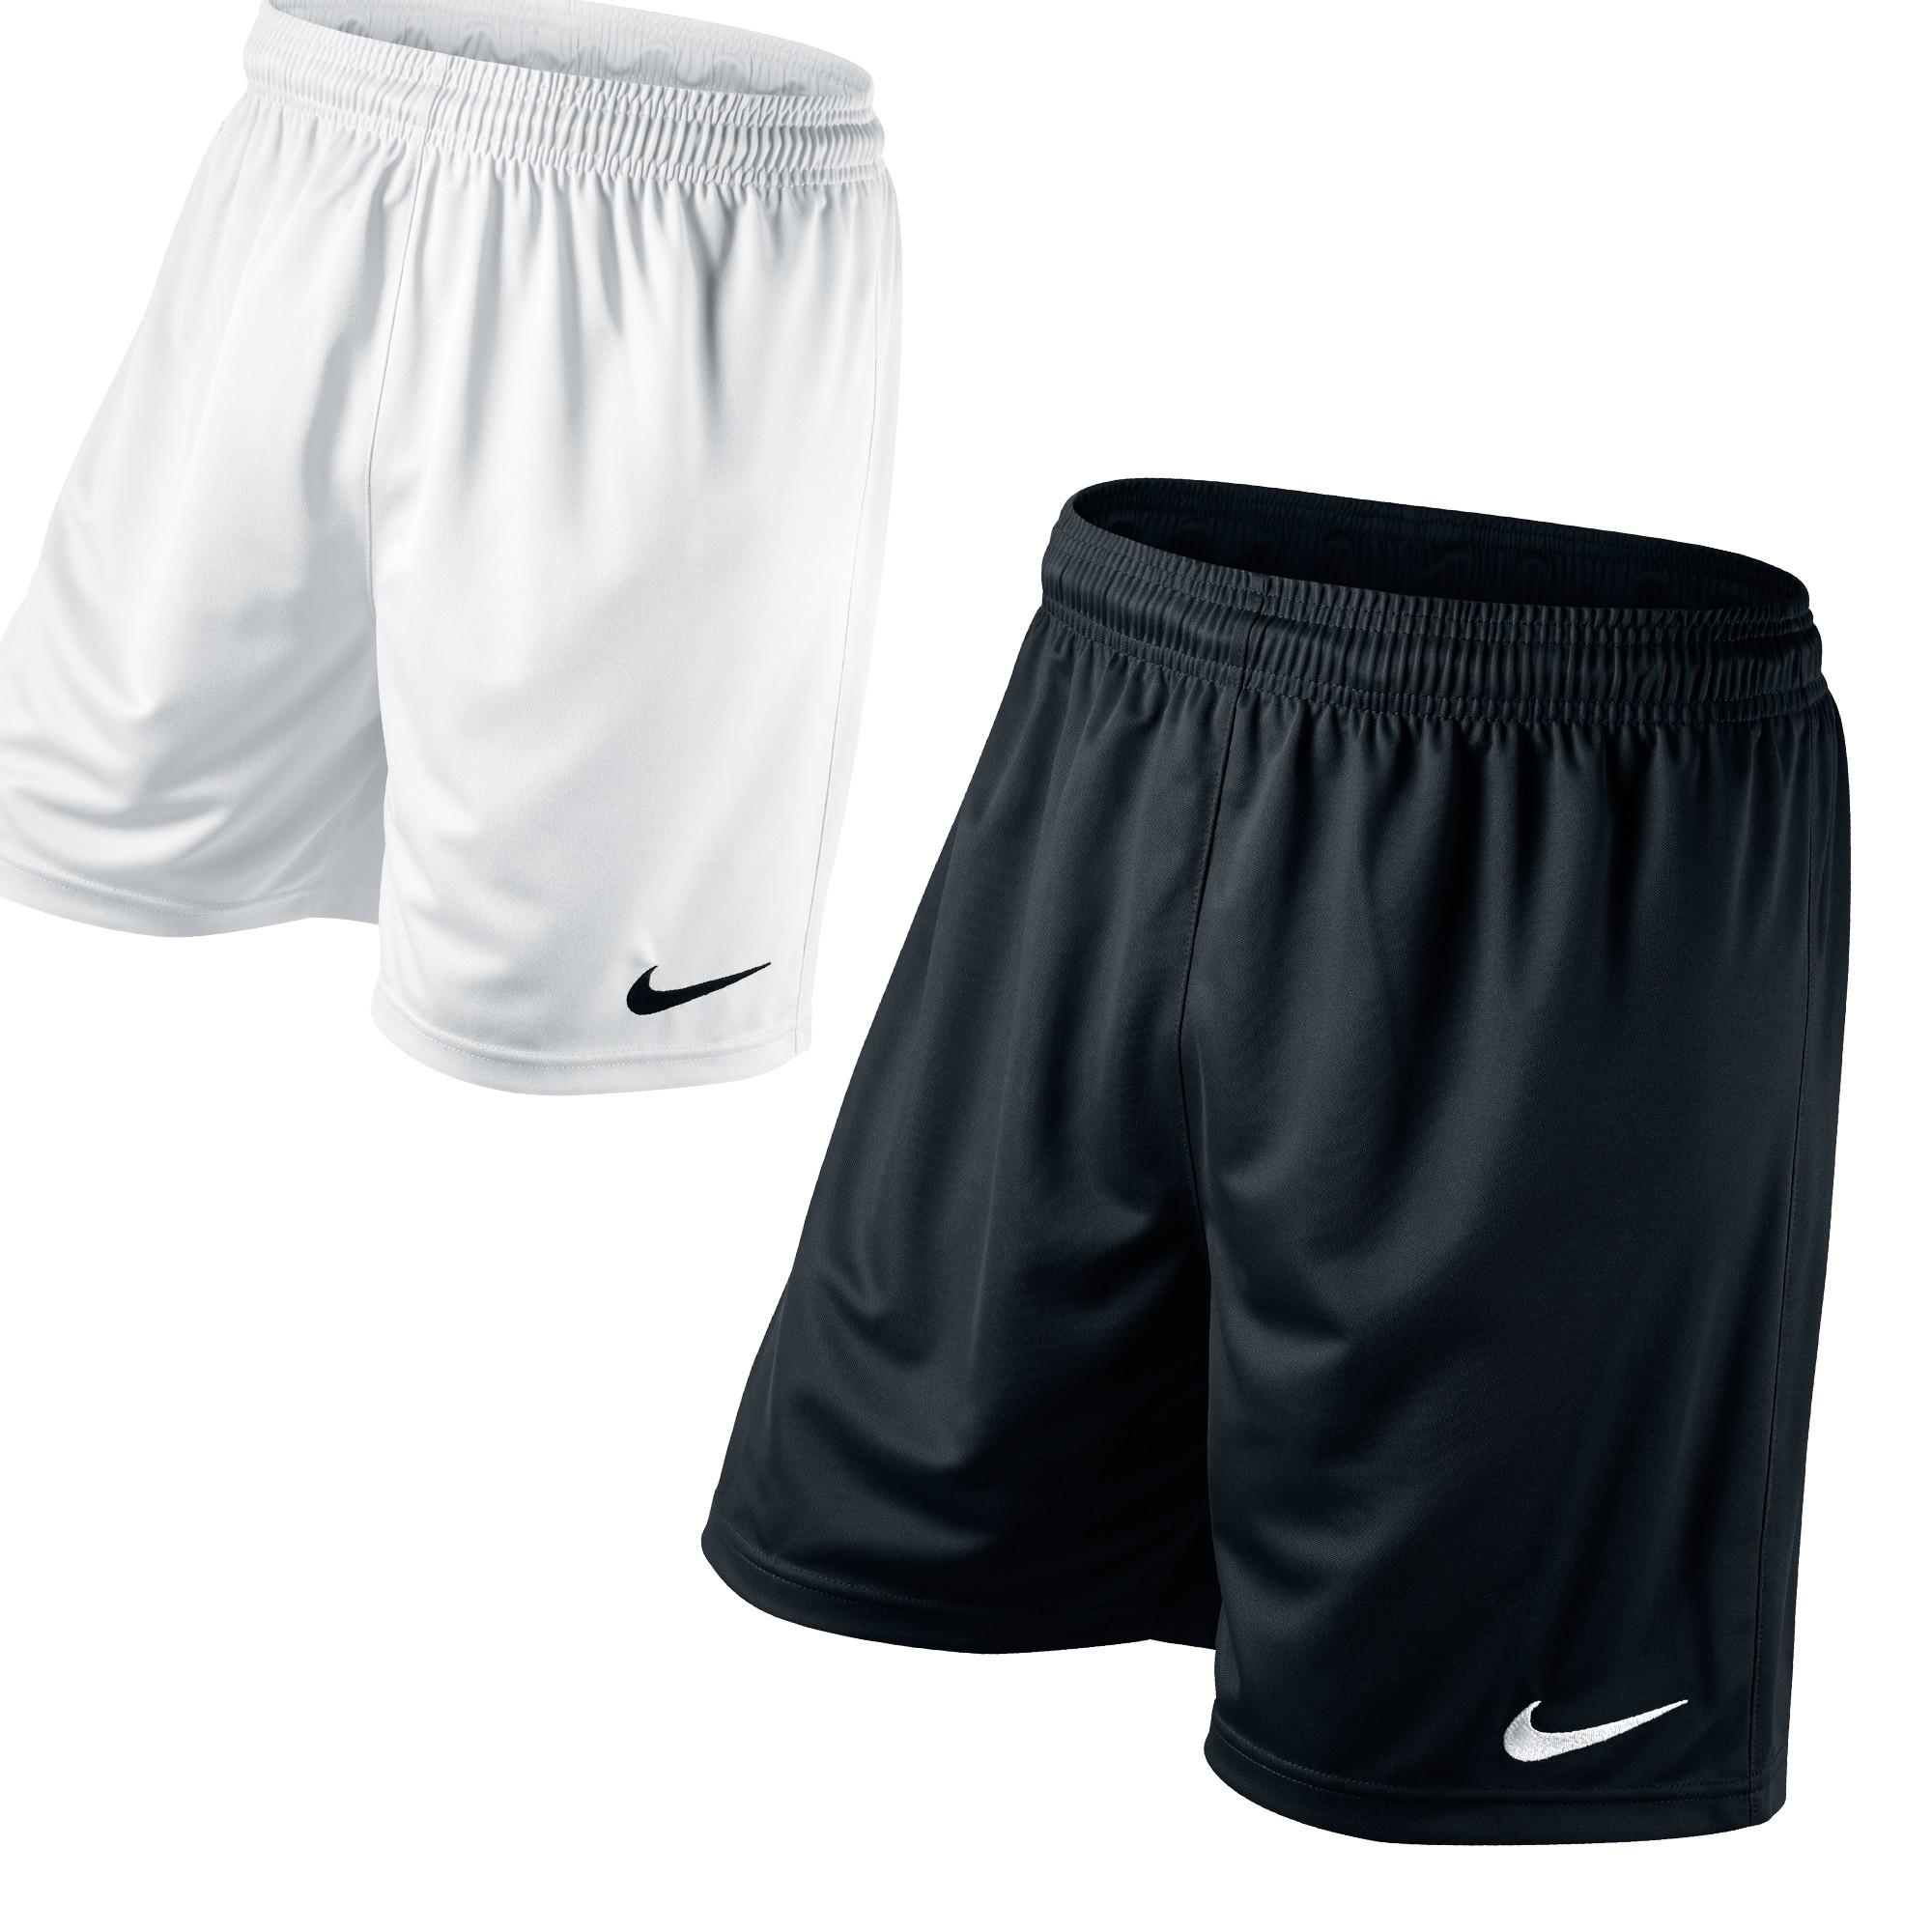 uk availability hot sale online where can i buy Wo kriege ich kurze Fitnesshosen mit Reißverschluss-Taschen ...